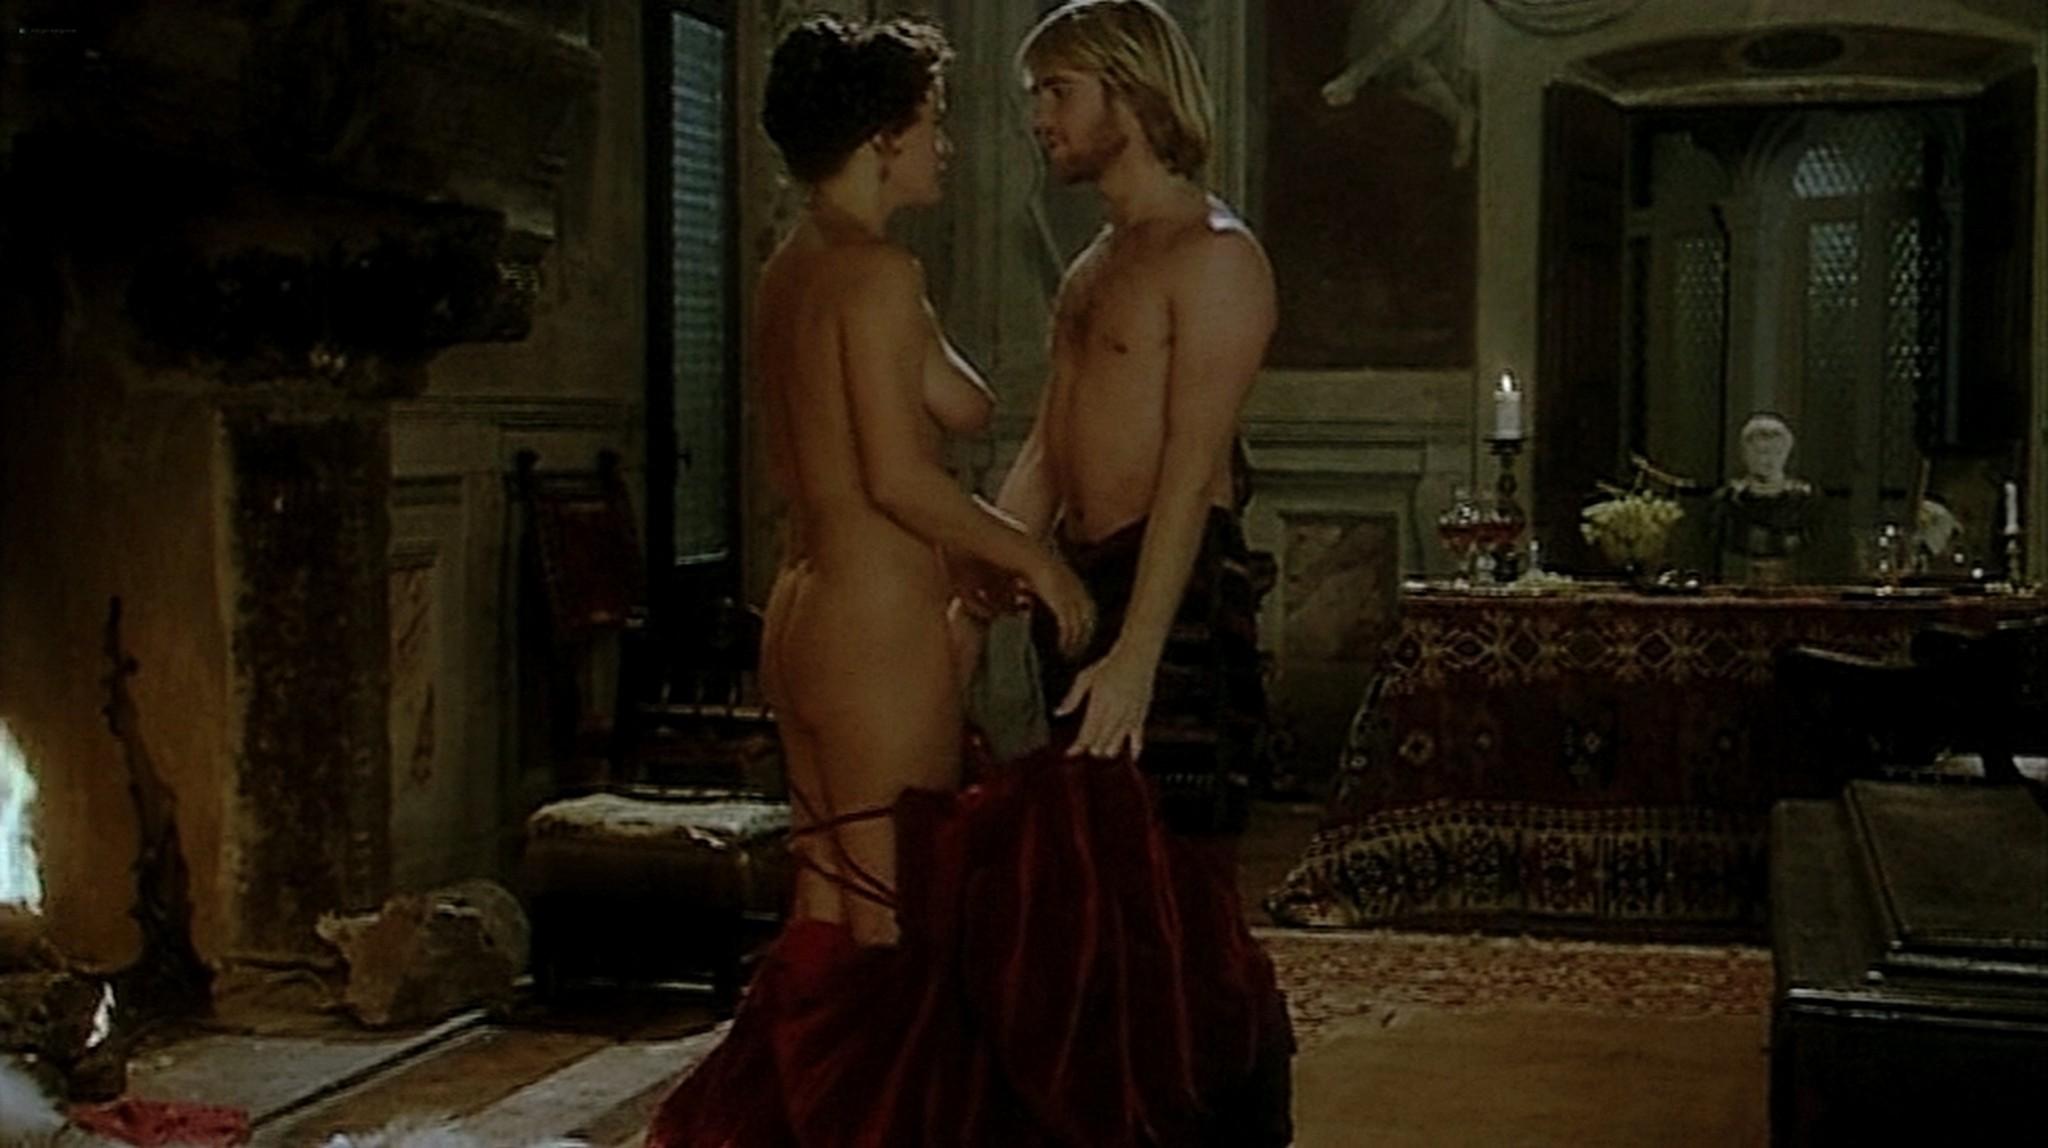 Laura Antonelli nude topless and sex Monica Guerritore nude topless and Clelia Rondinella nude lesbian sex La Venexiana 1986 DVDRip 7